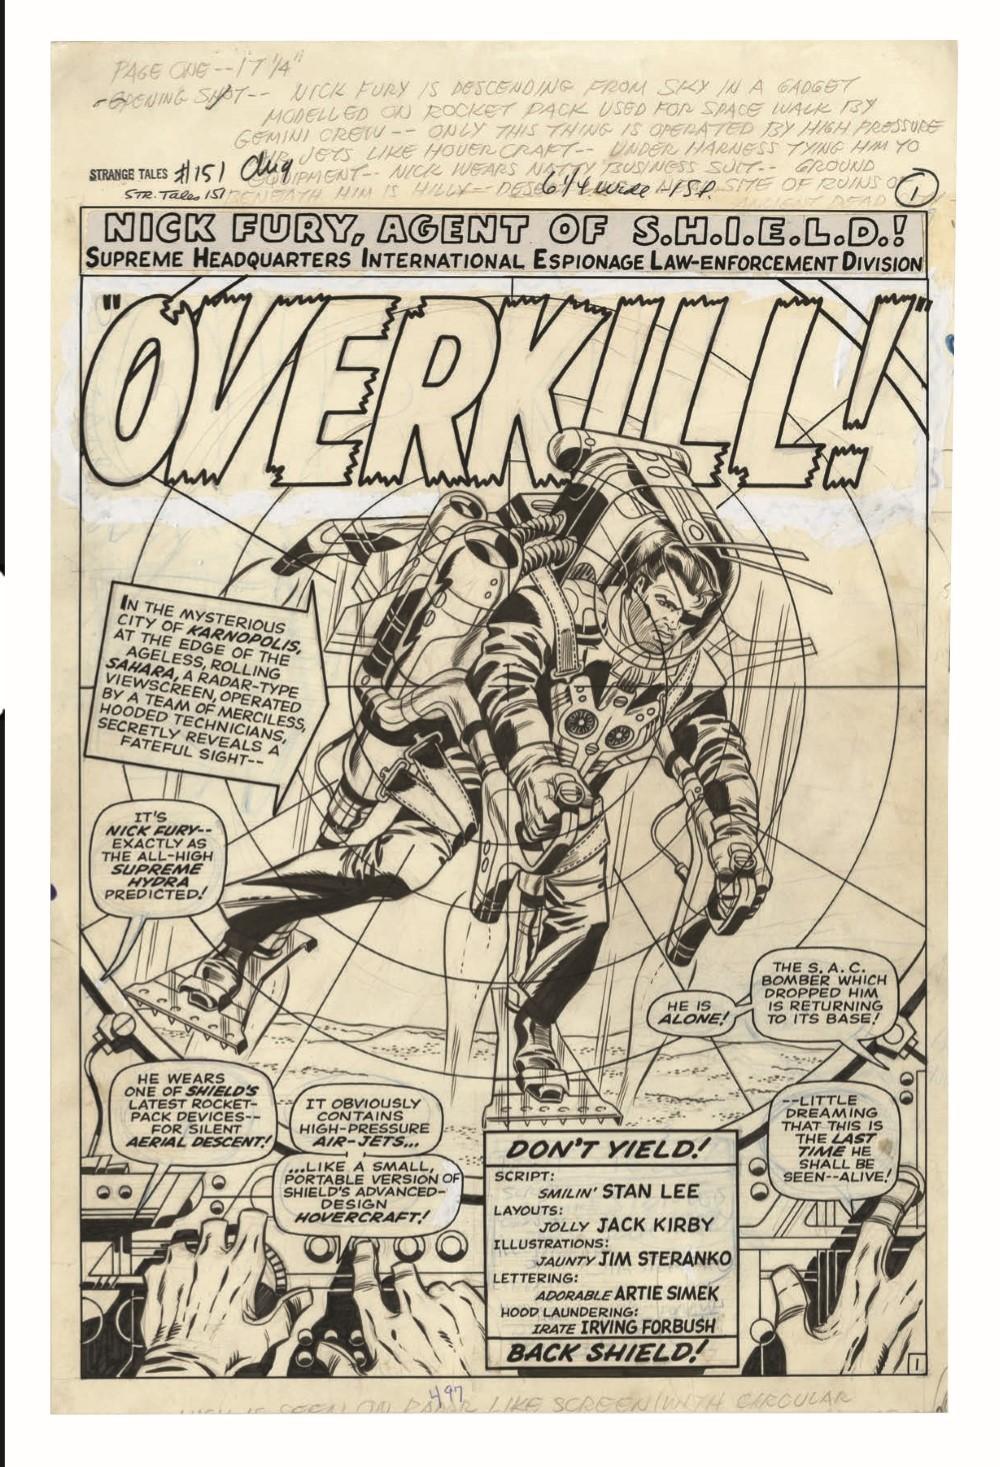 STERANKO_artisan_edition_pr-4 ComicList Previews: JIM STERANKO'S NICK FURY AGENT OF S.H.I.E.L.D. ARTISAN EDITION TP